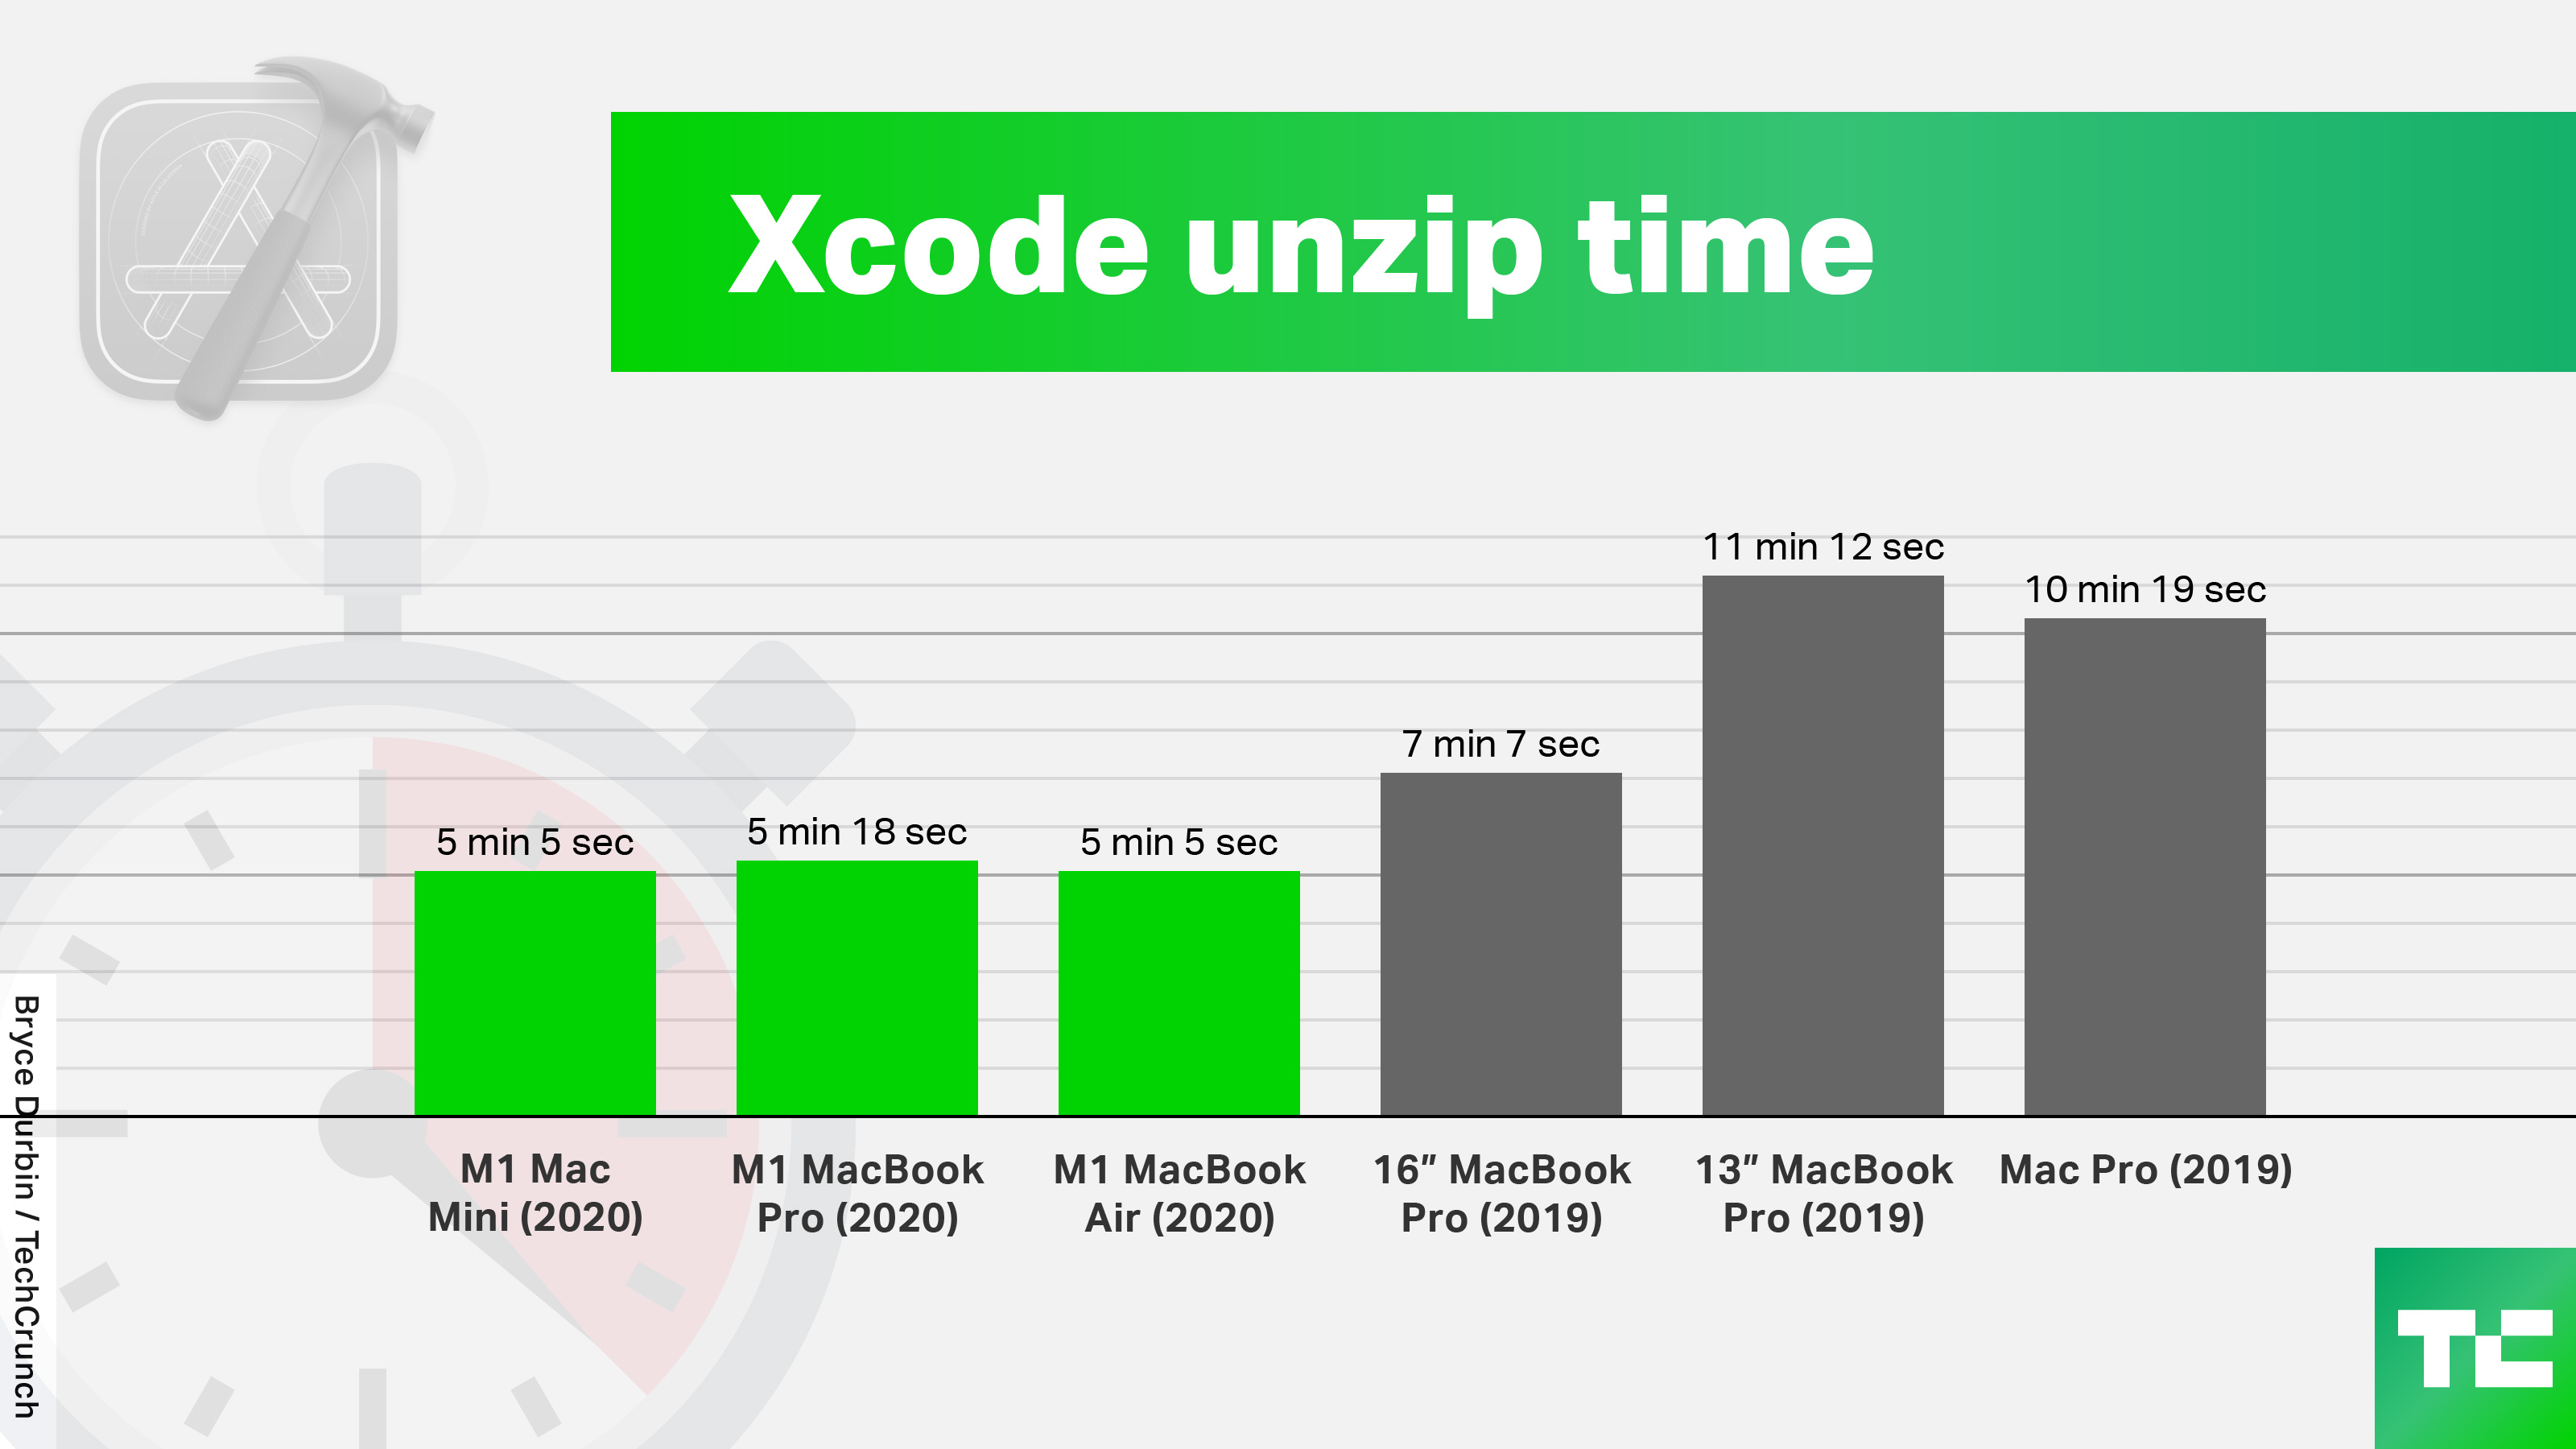 xcode unzip time